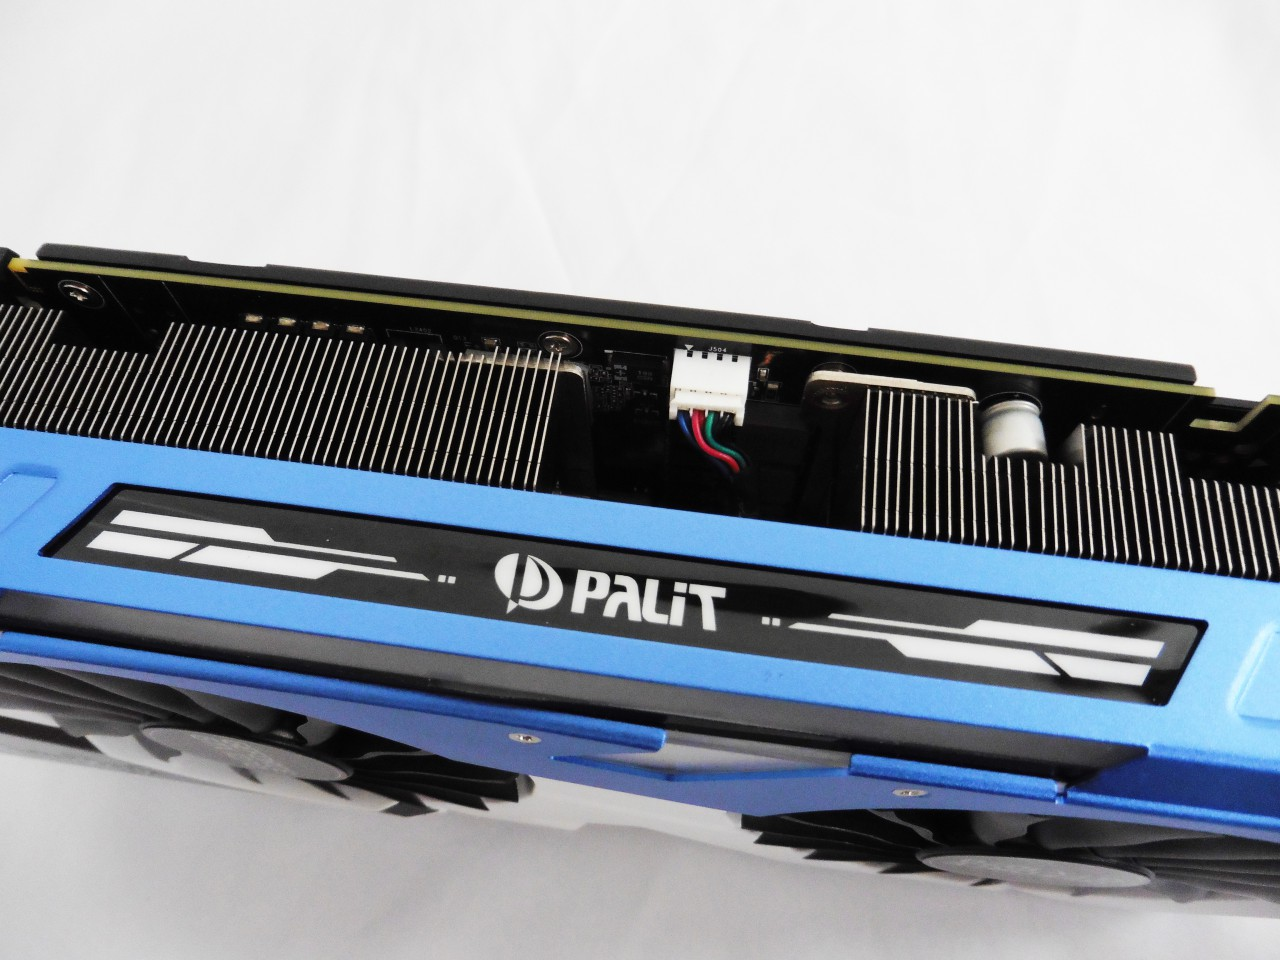 Unboxing & Review: Palit GeForce GTX 1070 GameRock